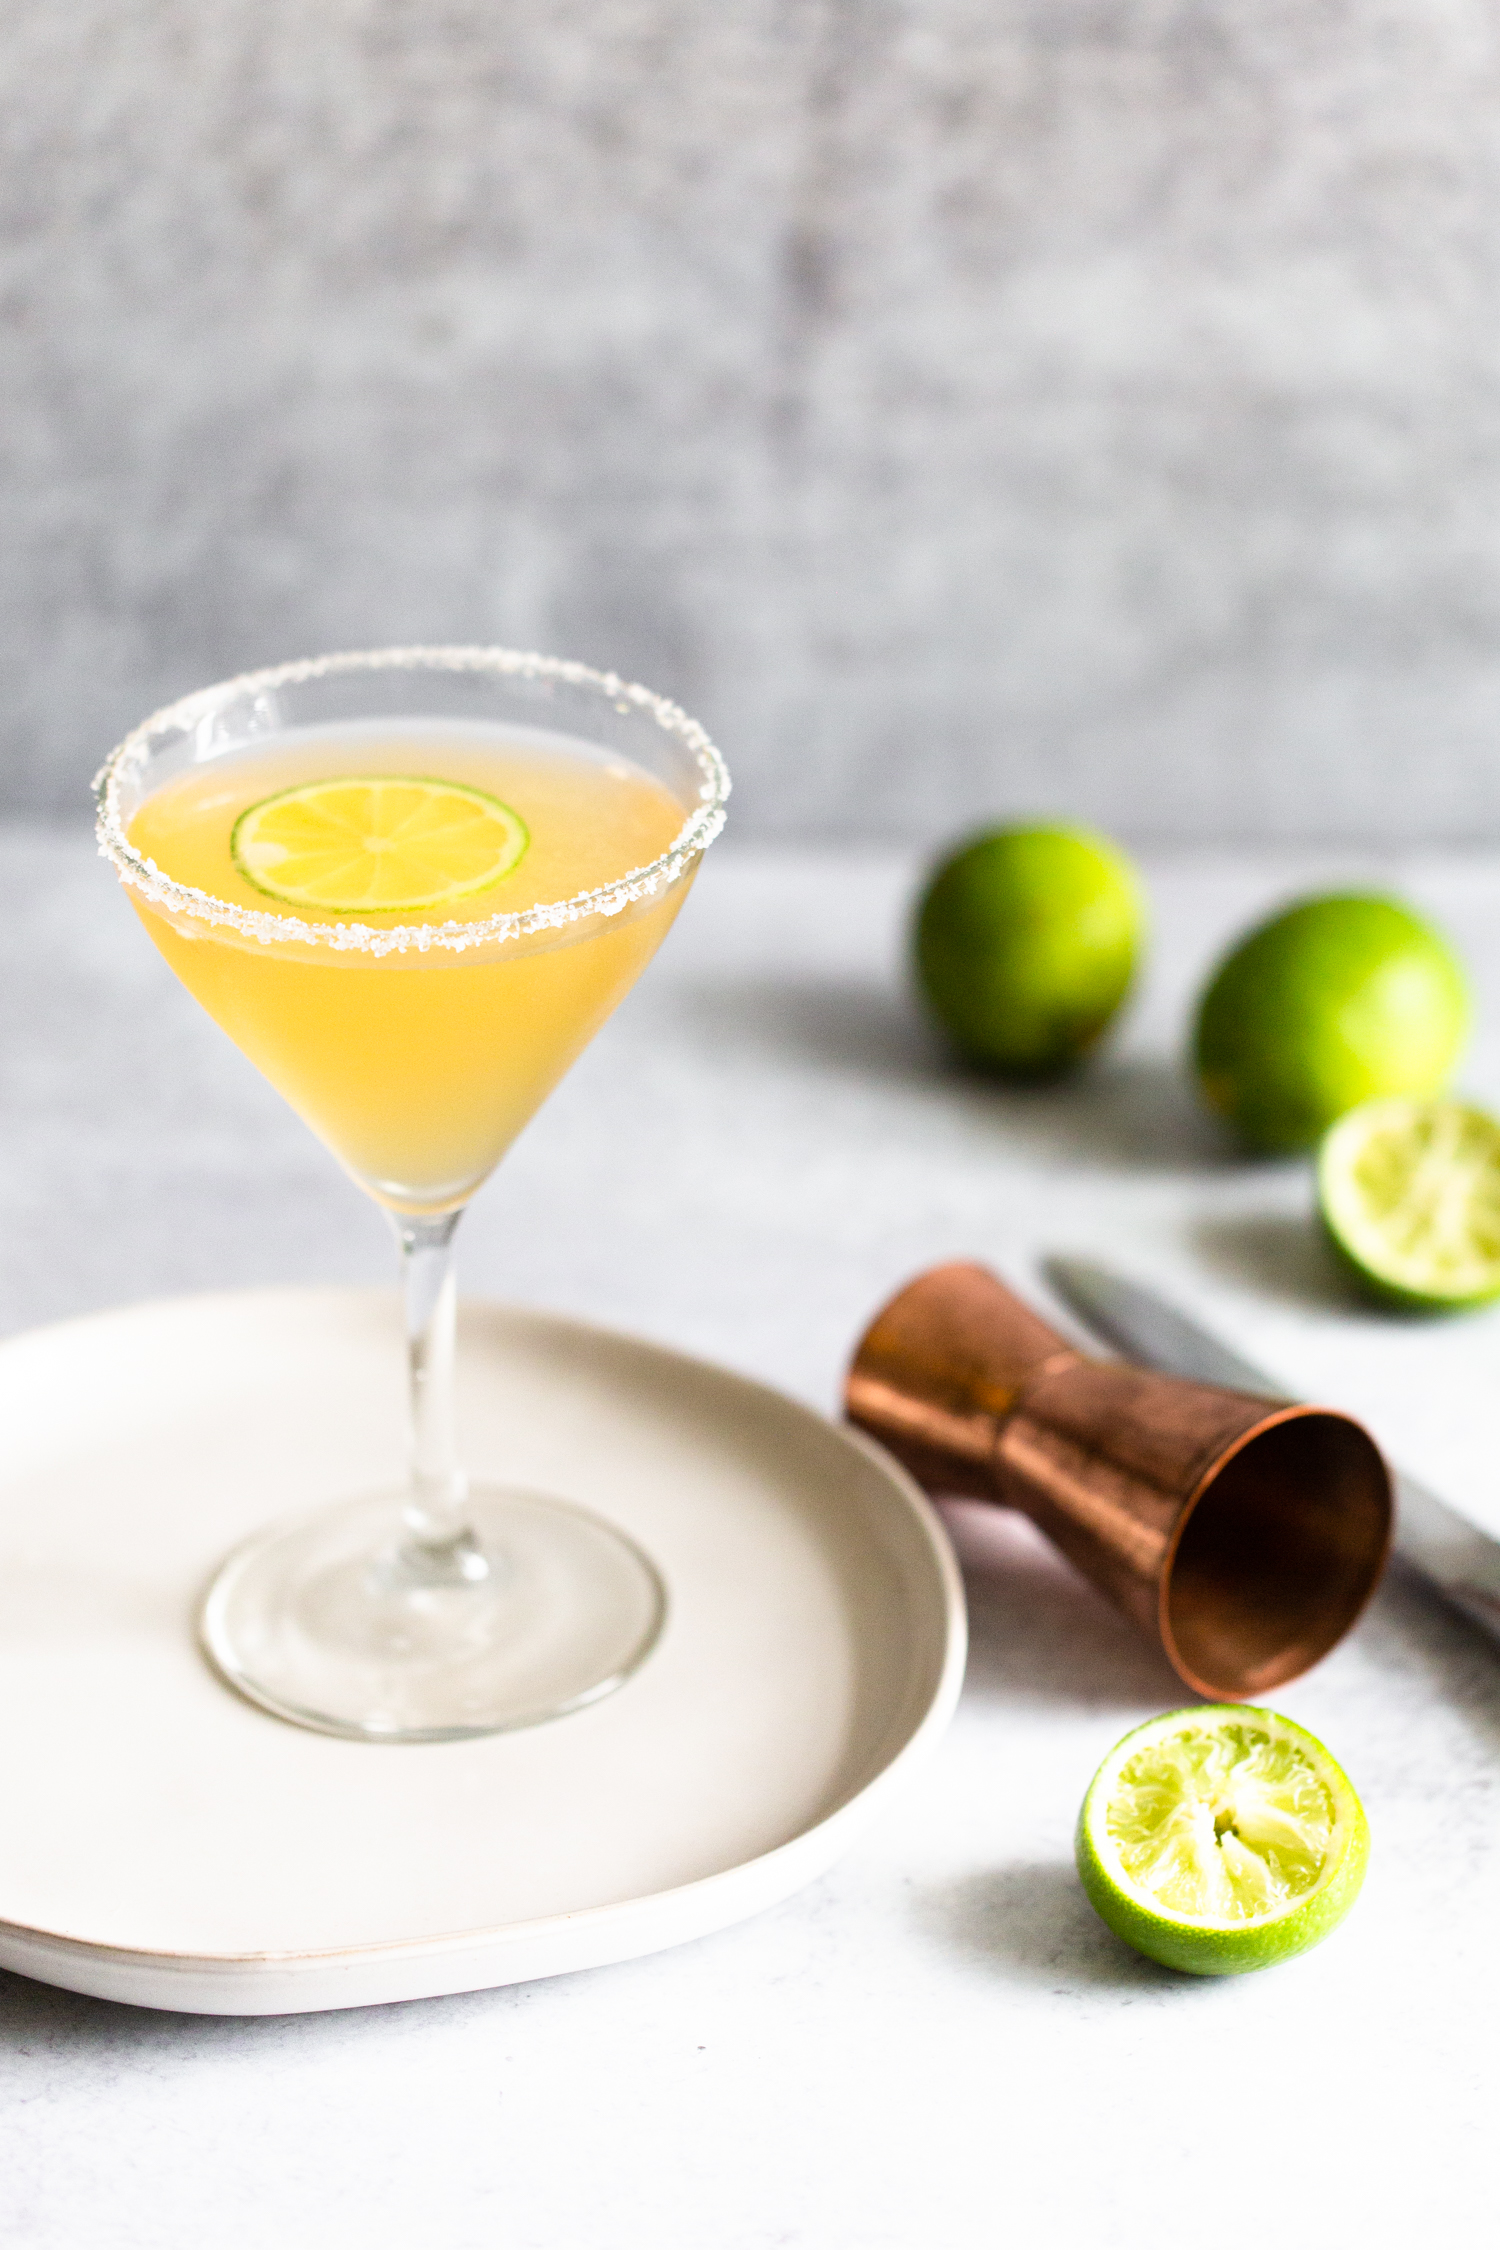 Homemade Italian Margarita